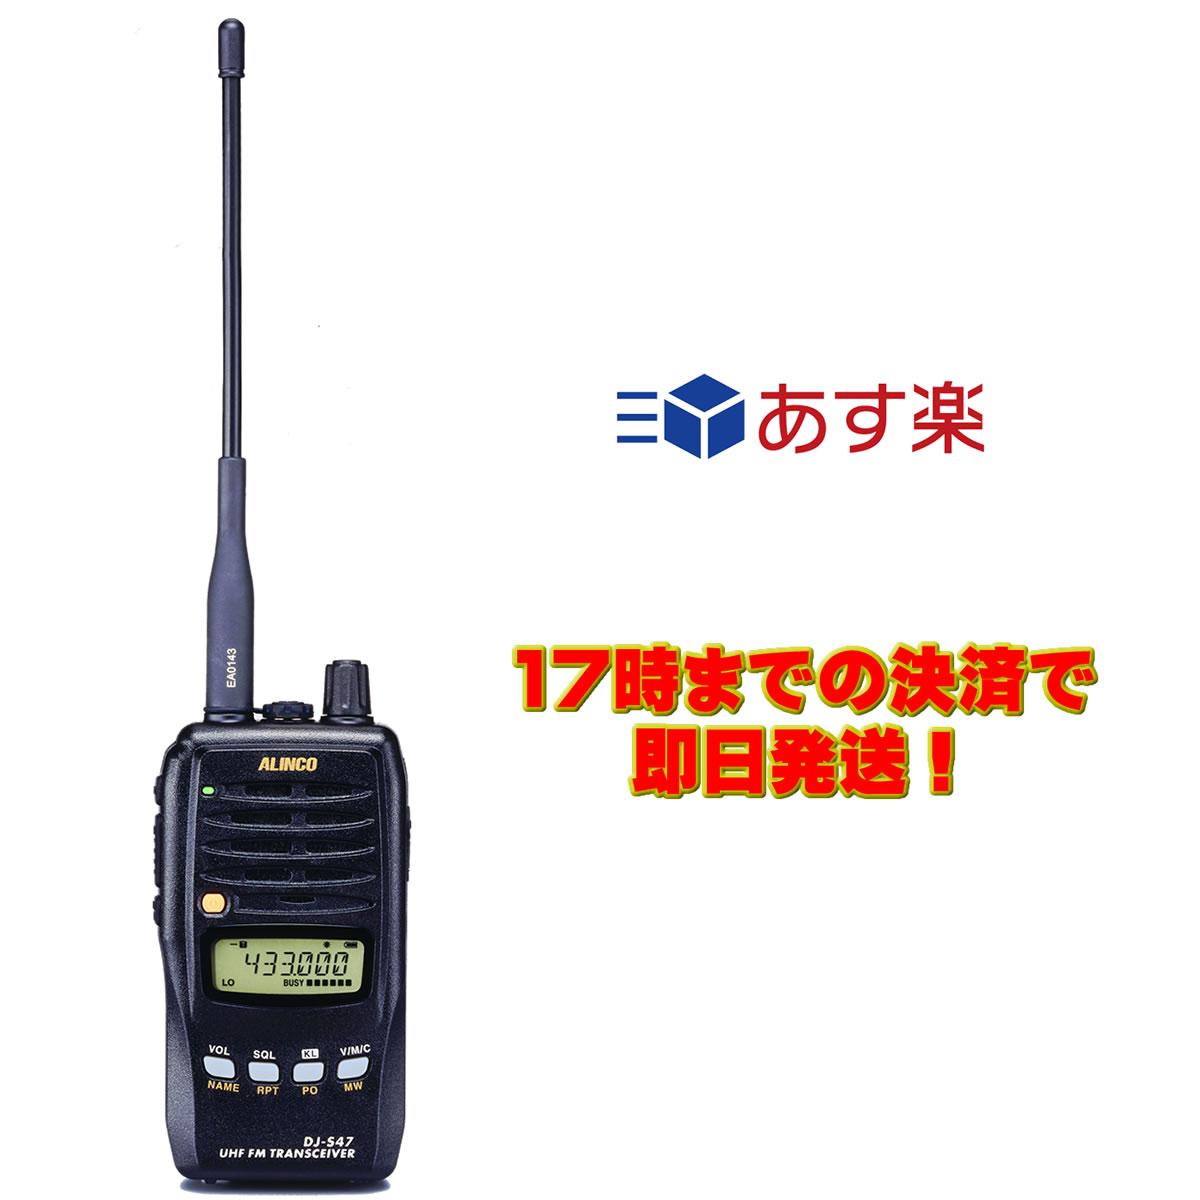 DJ-S47L アルインコ 430MHz 防水型FMハンディトランシーバー 5W